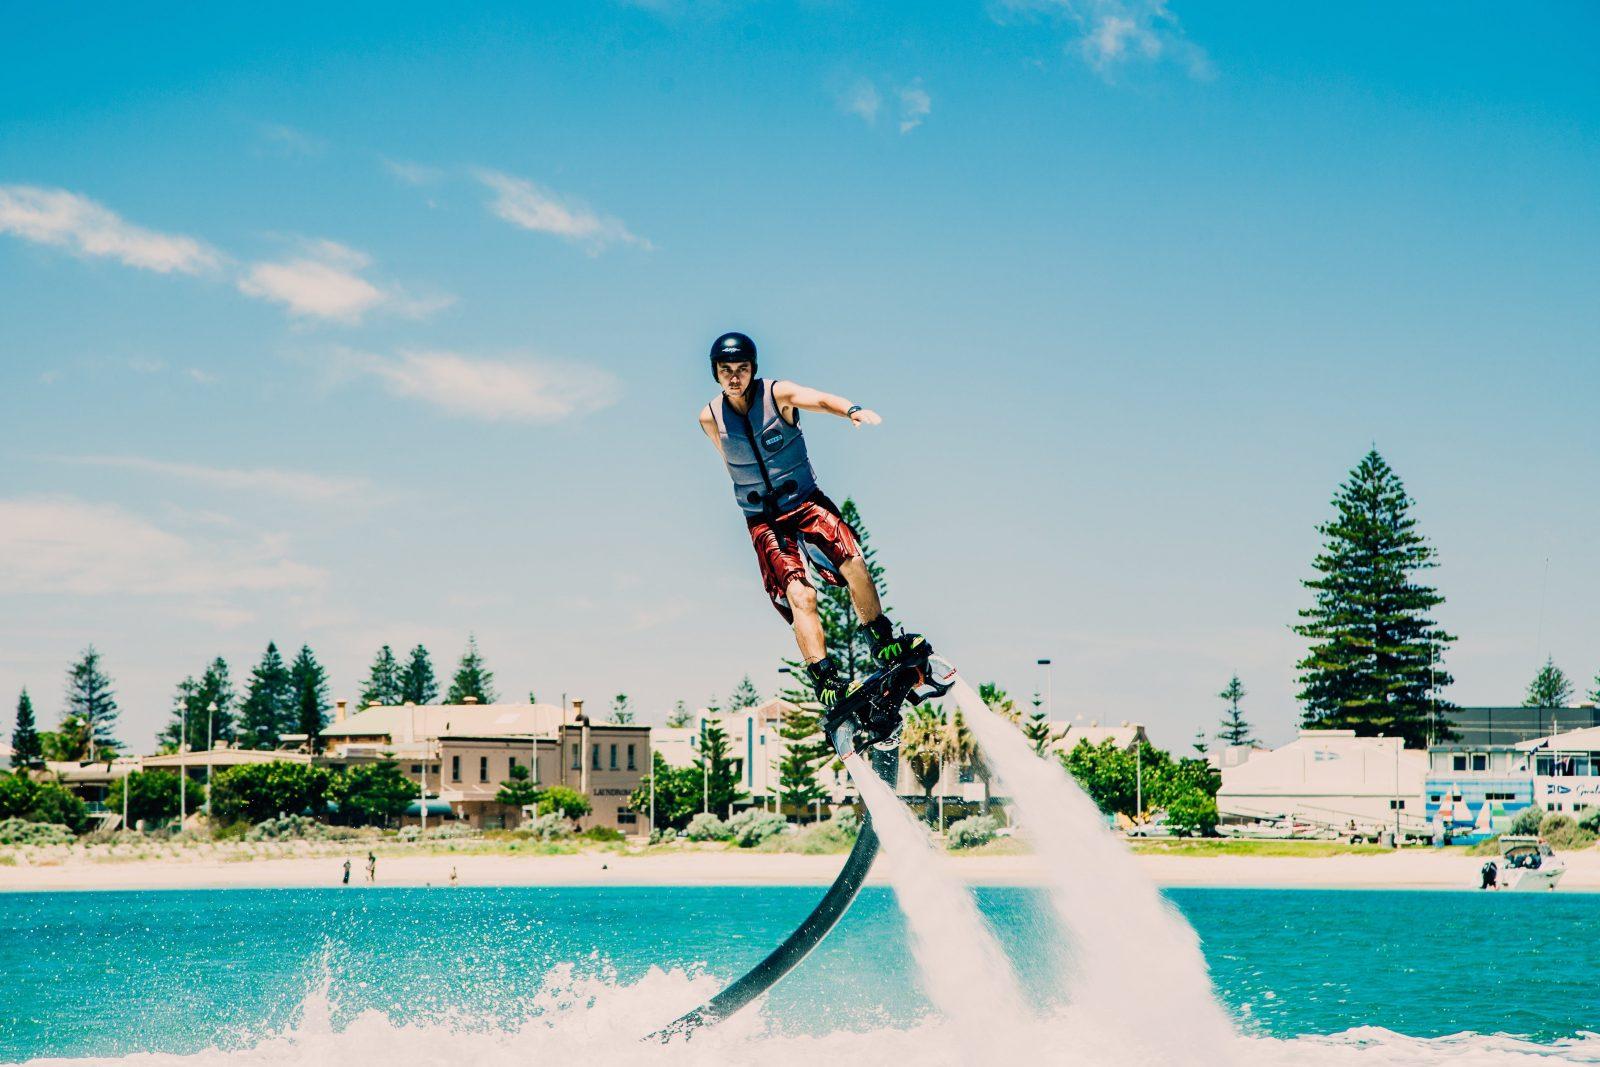 Ultimate Watersports, Broome, Western Australia